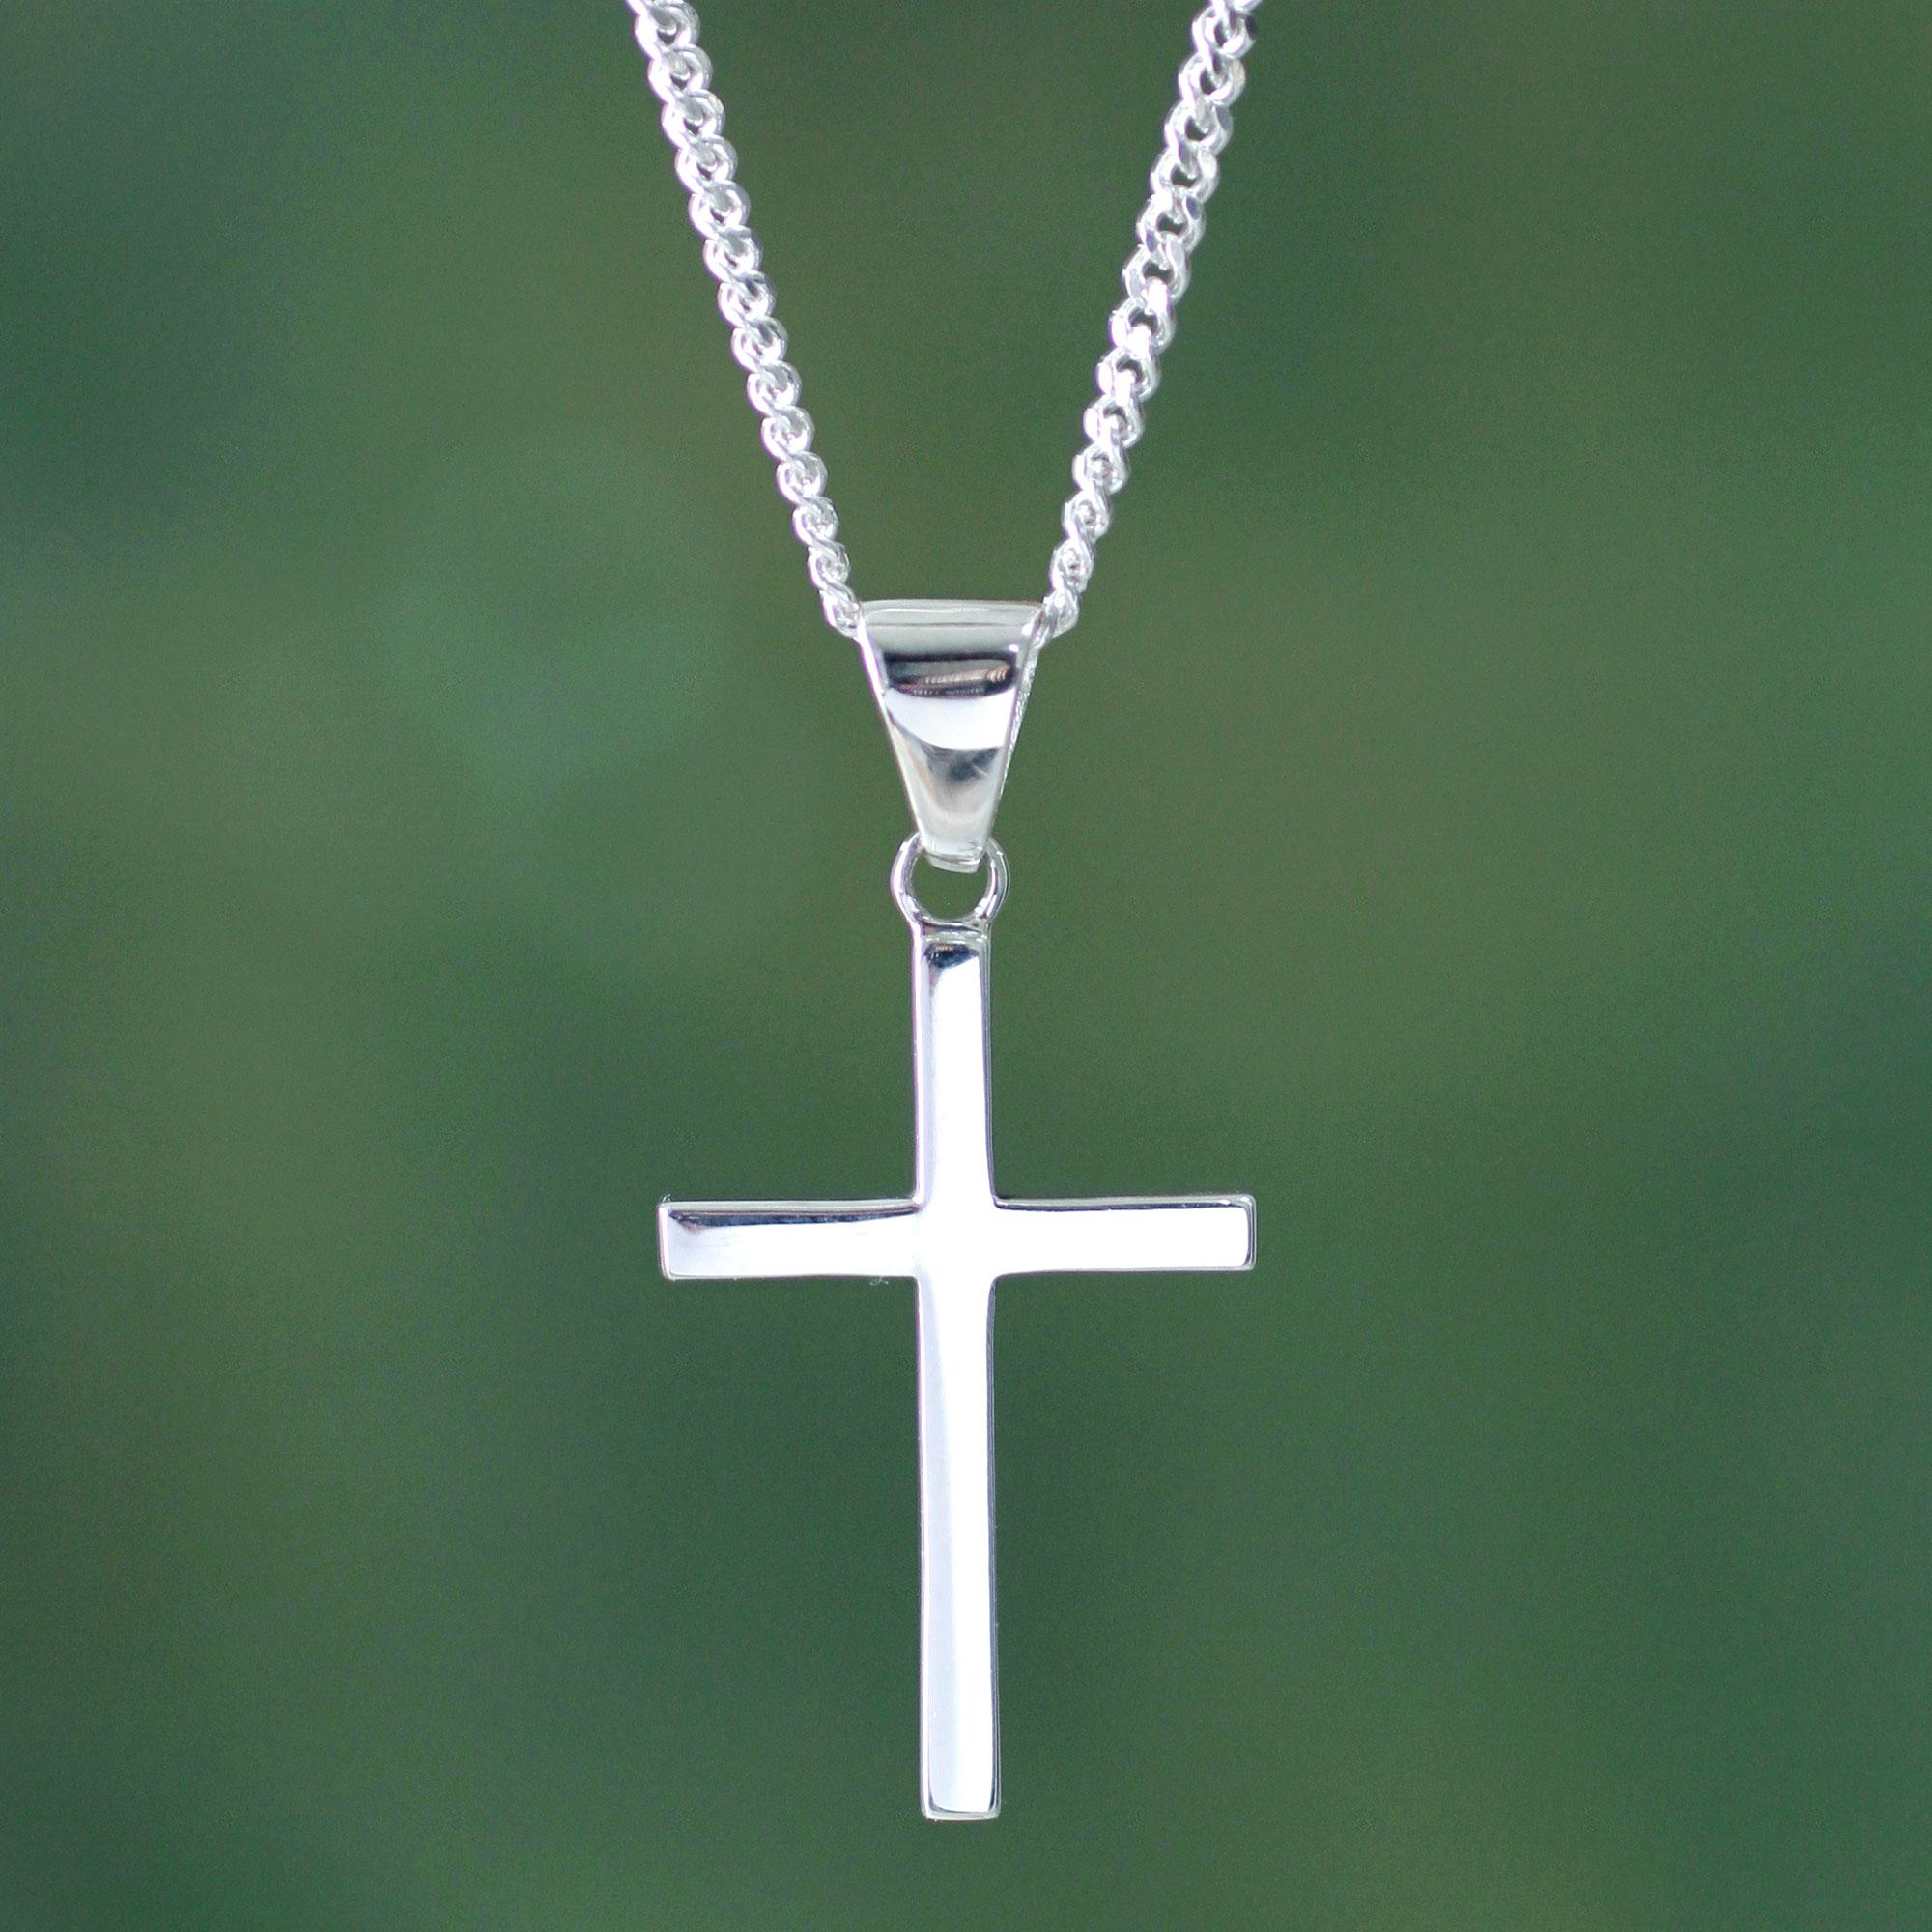 Men s Cross Necklaces at NOVICA